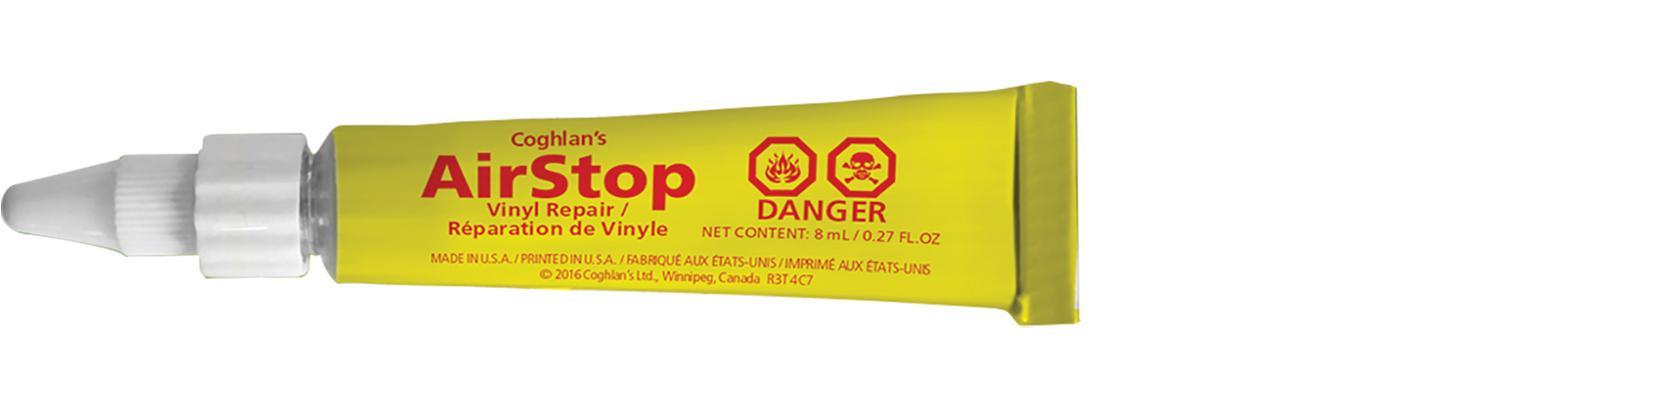 Amazon.com: Coghlan's Airstop Sealant, 0.27-Ounce/ 8 ml